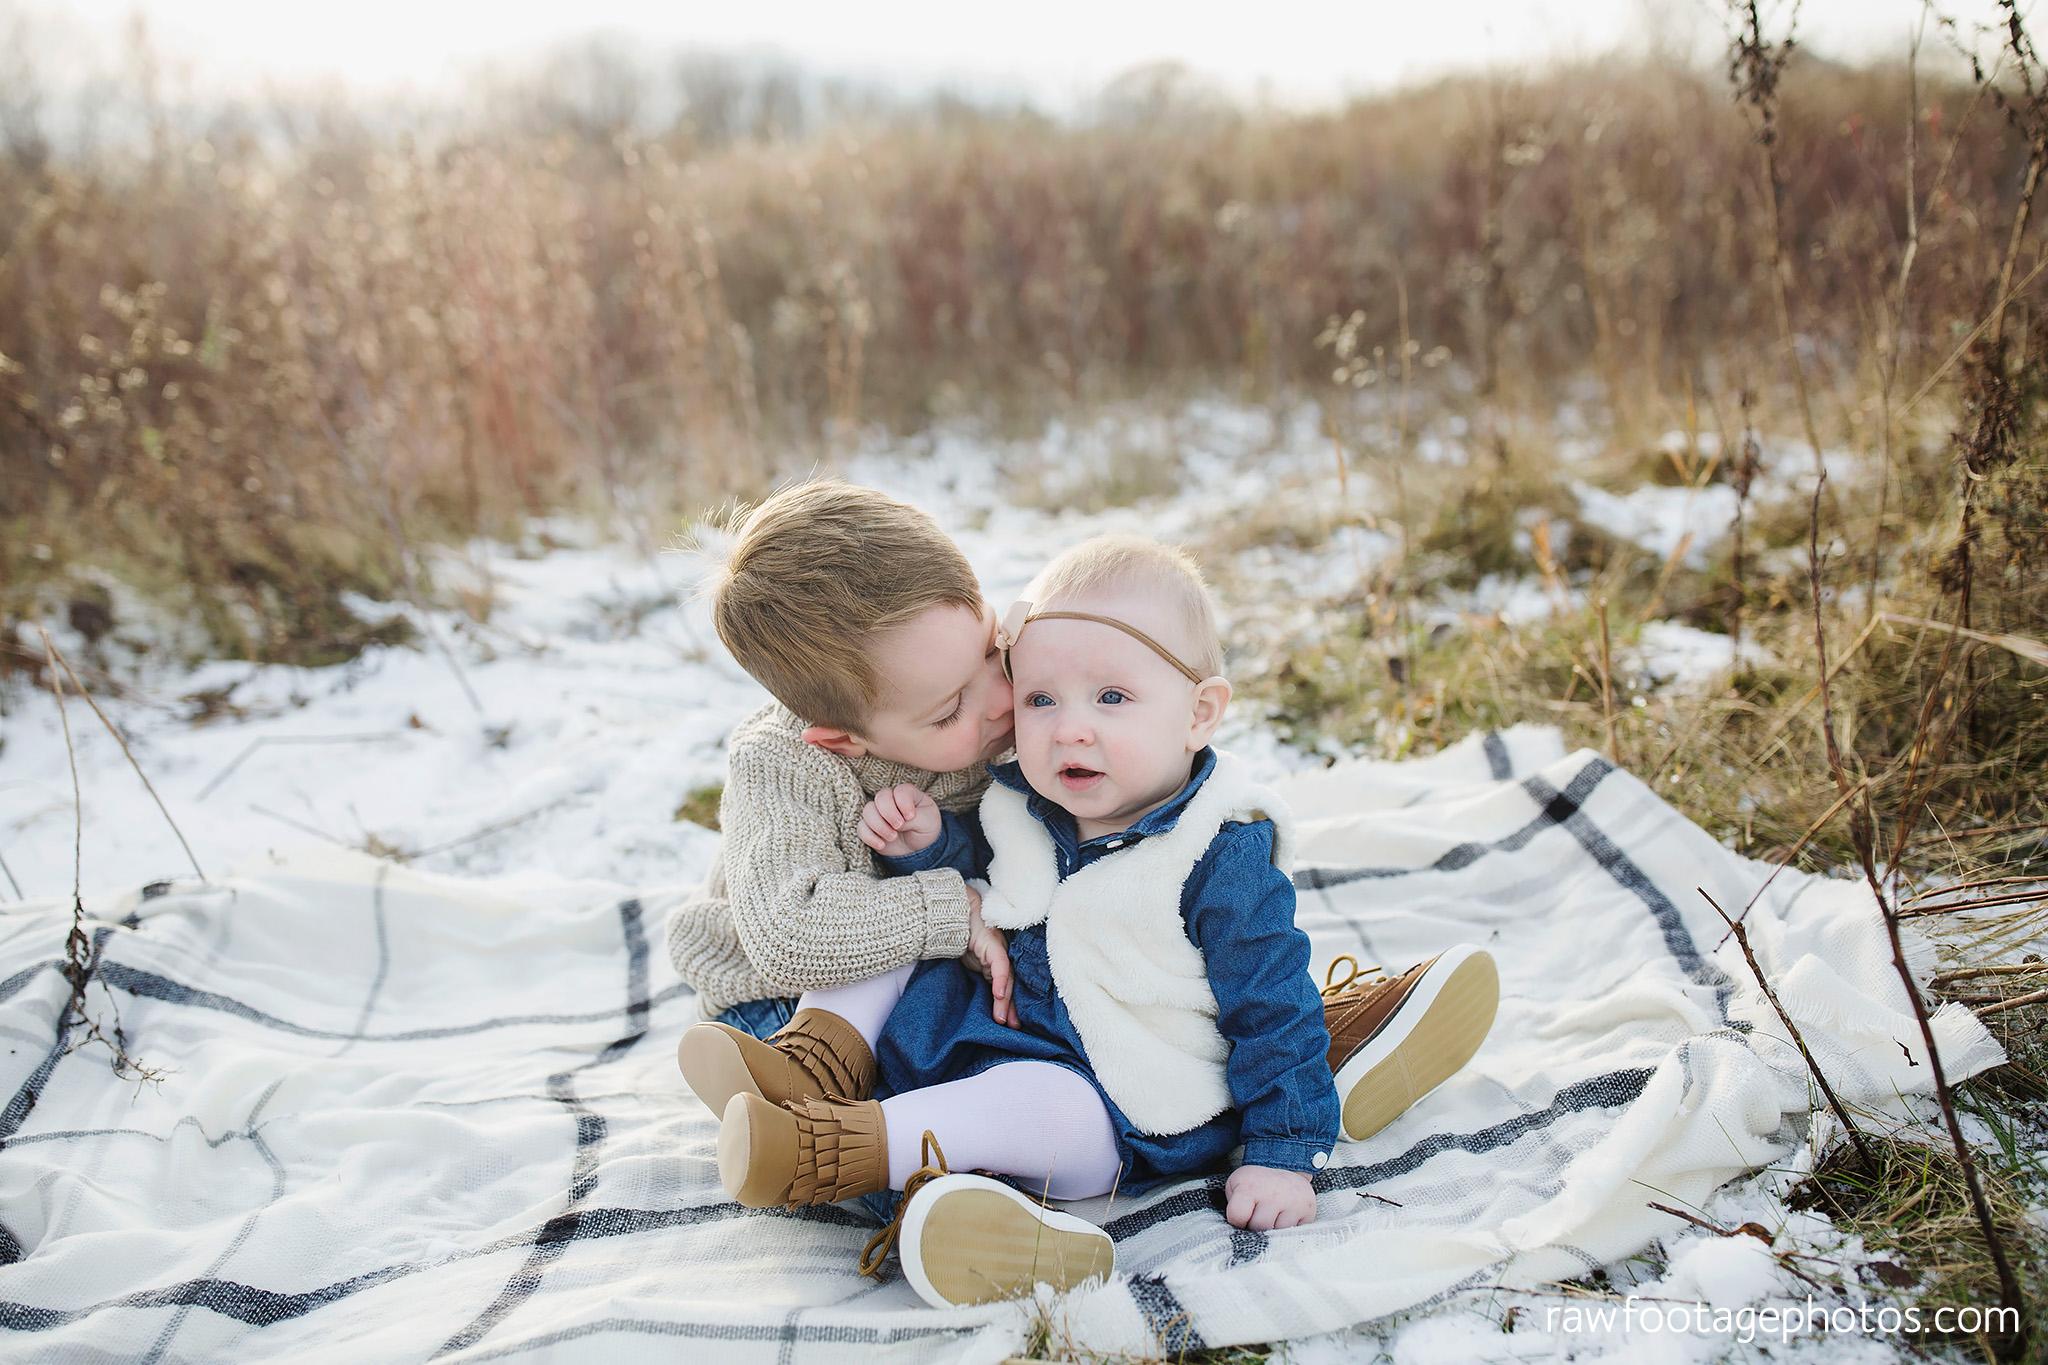 london_ontario_family_photographer-greenhouse_photos-winter_field_photos-raw_footage_photography004.jpg